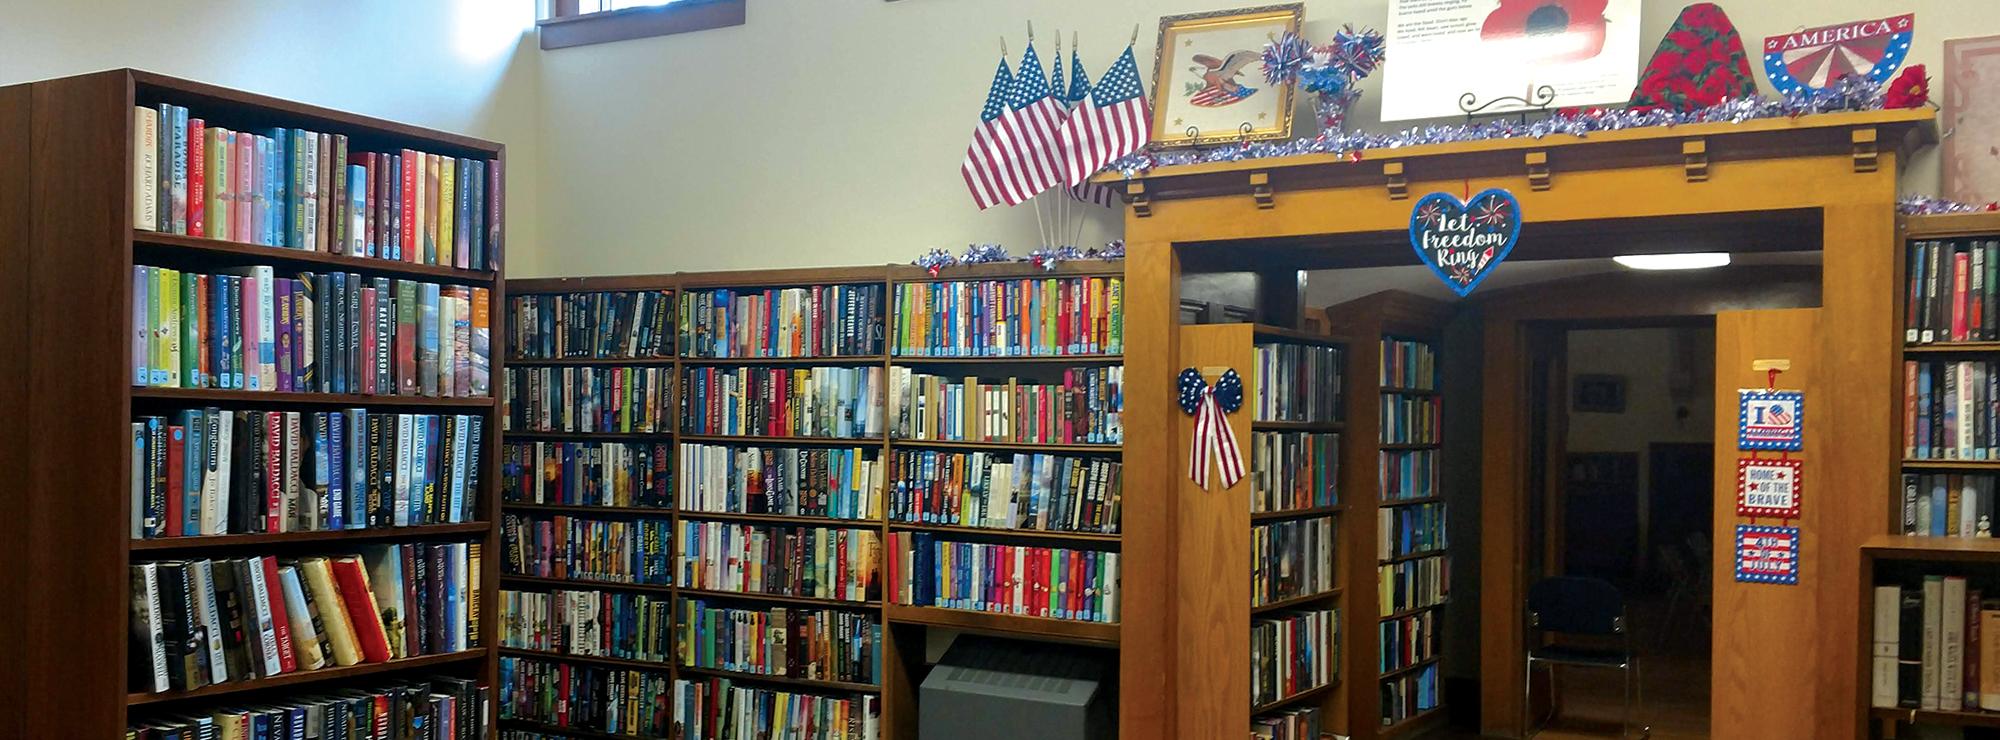 Photo shows library shelves full of books.